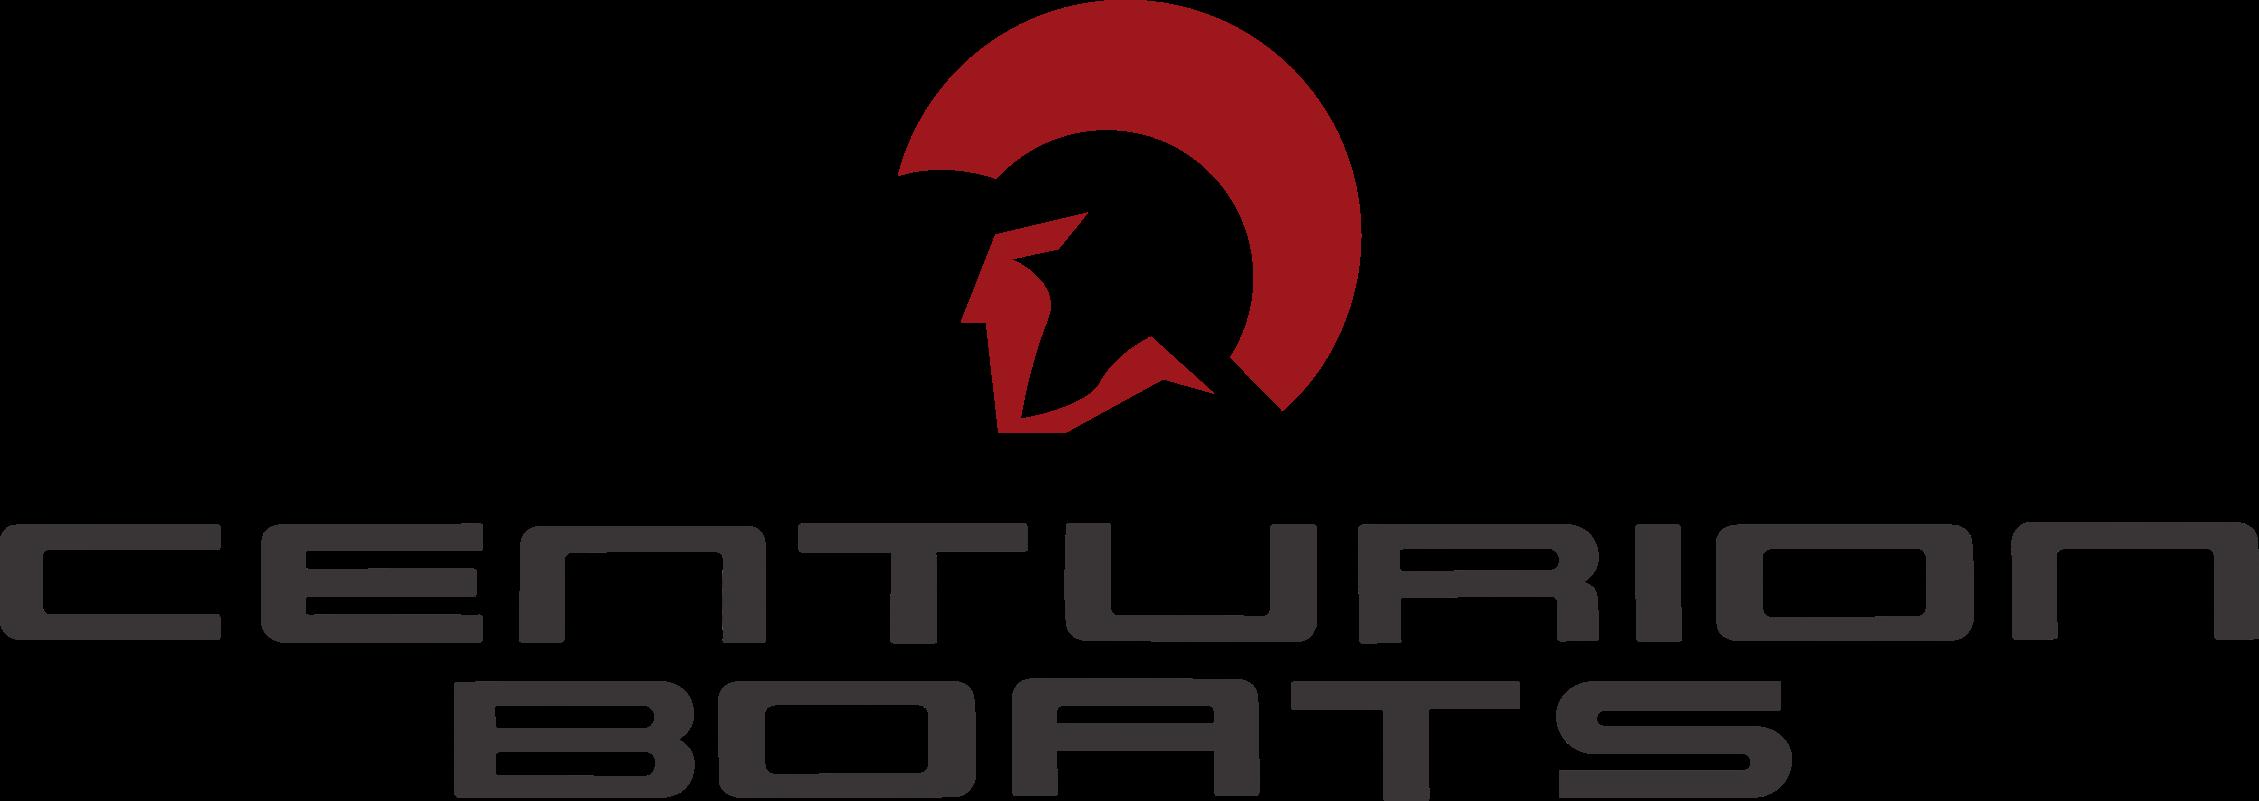 Centurion brand logo